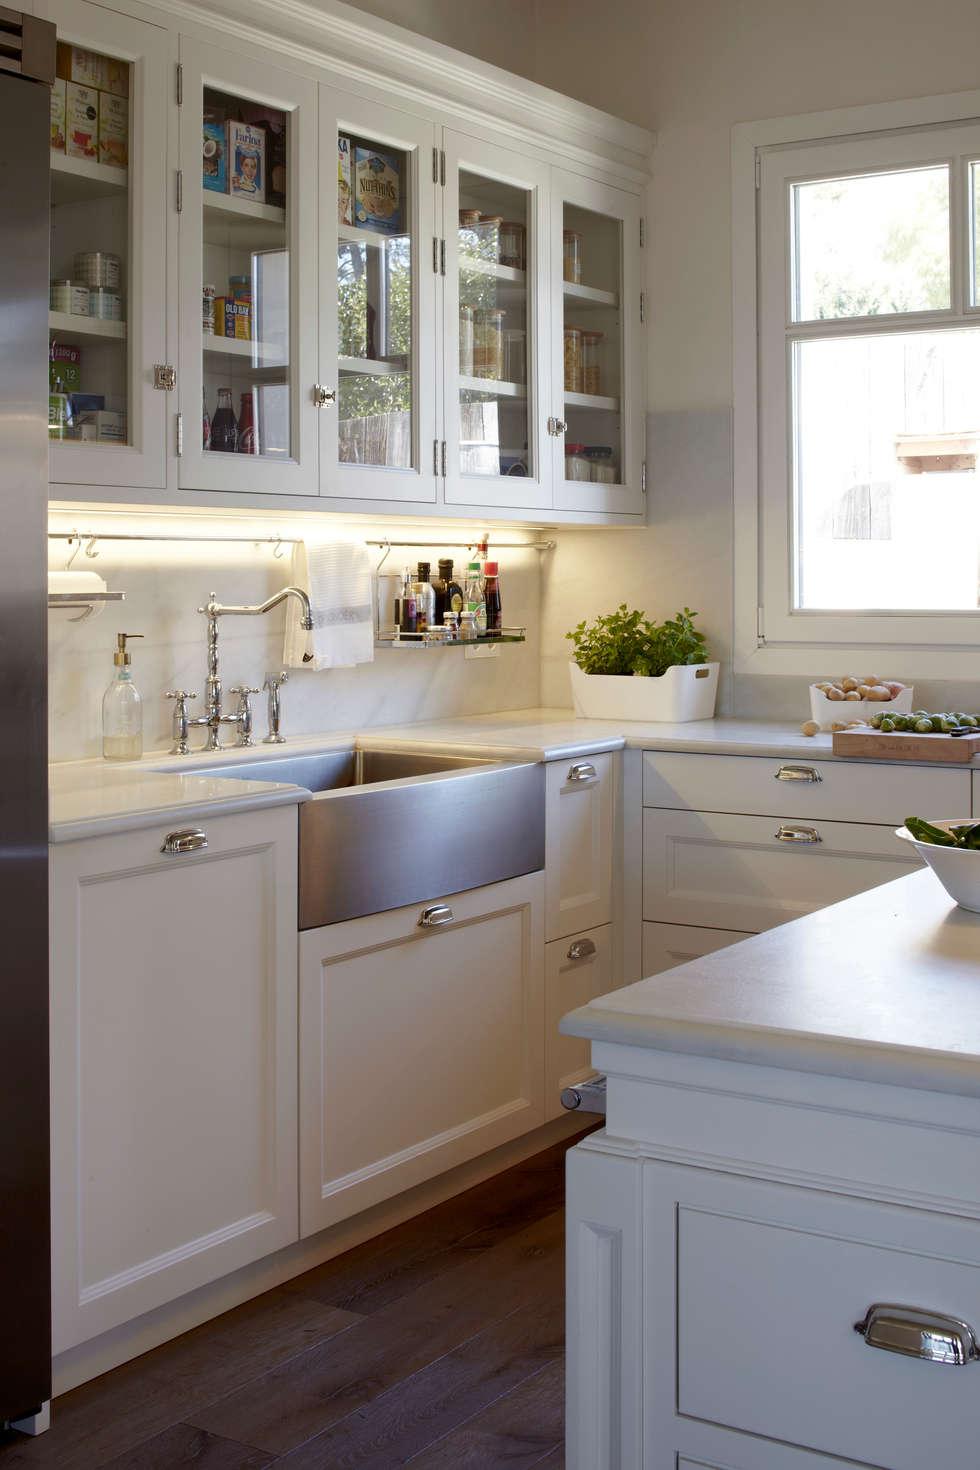 Fotos de decora o design de interiores e remodela es for Cocina estilo americano